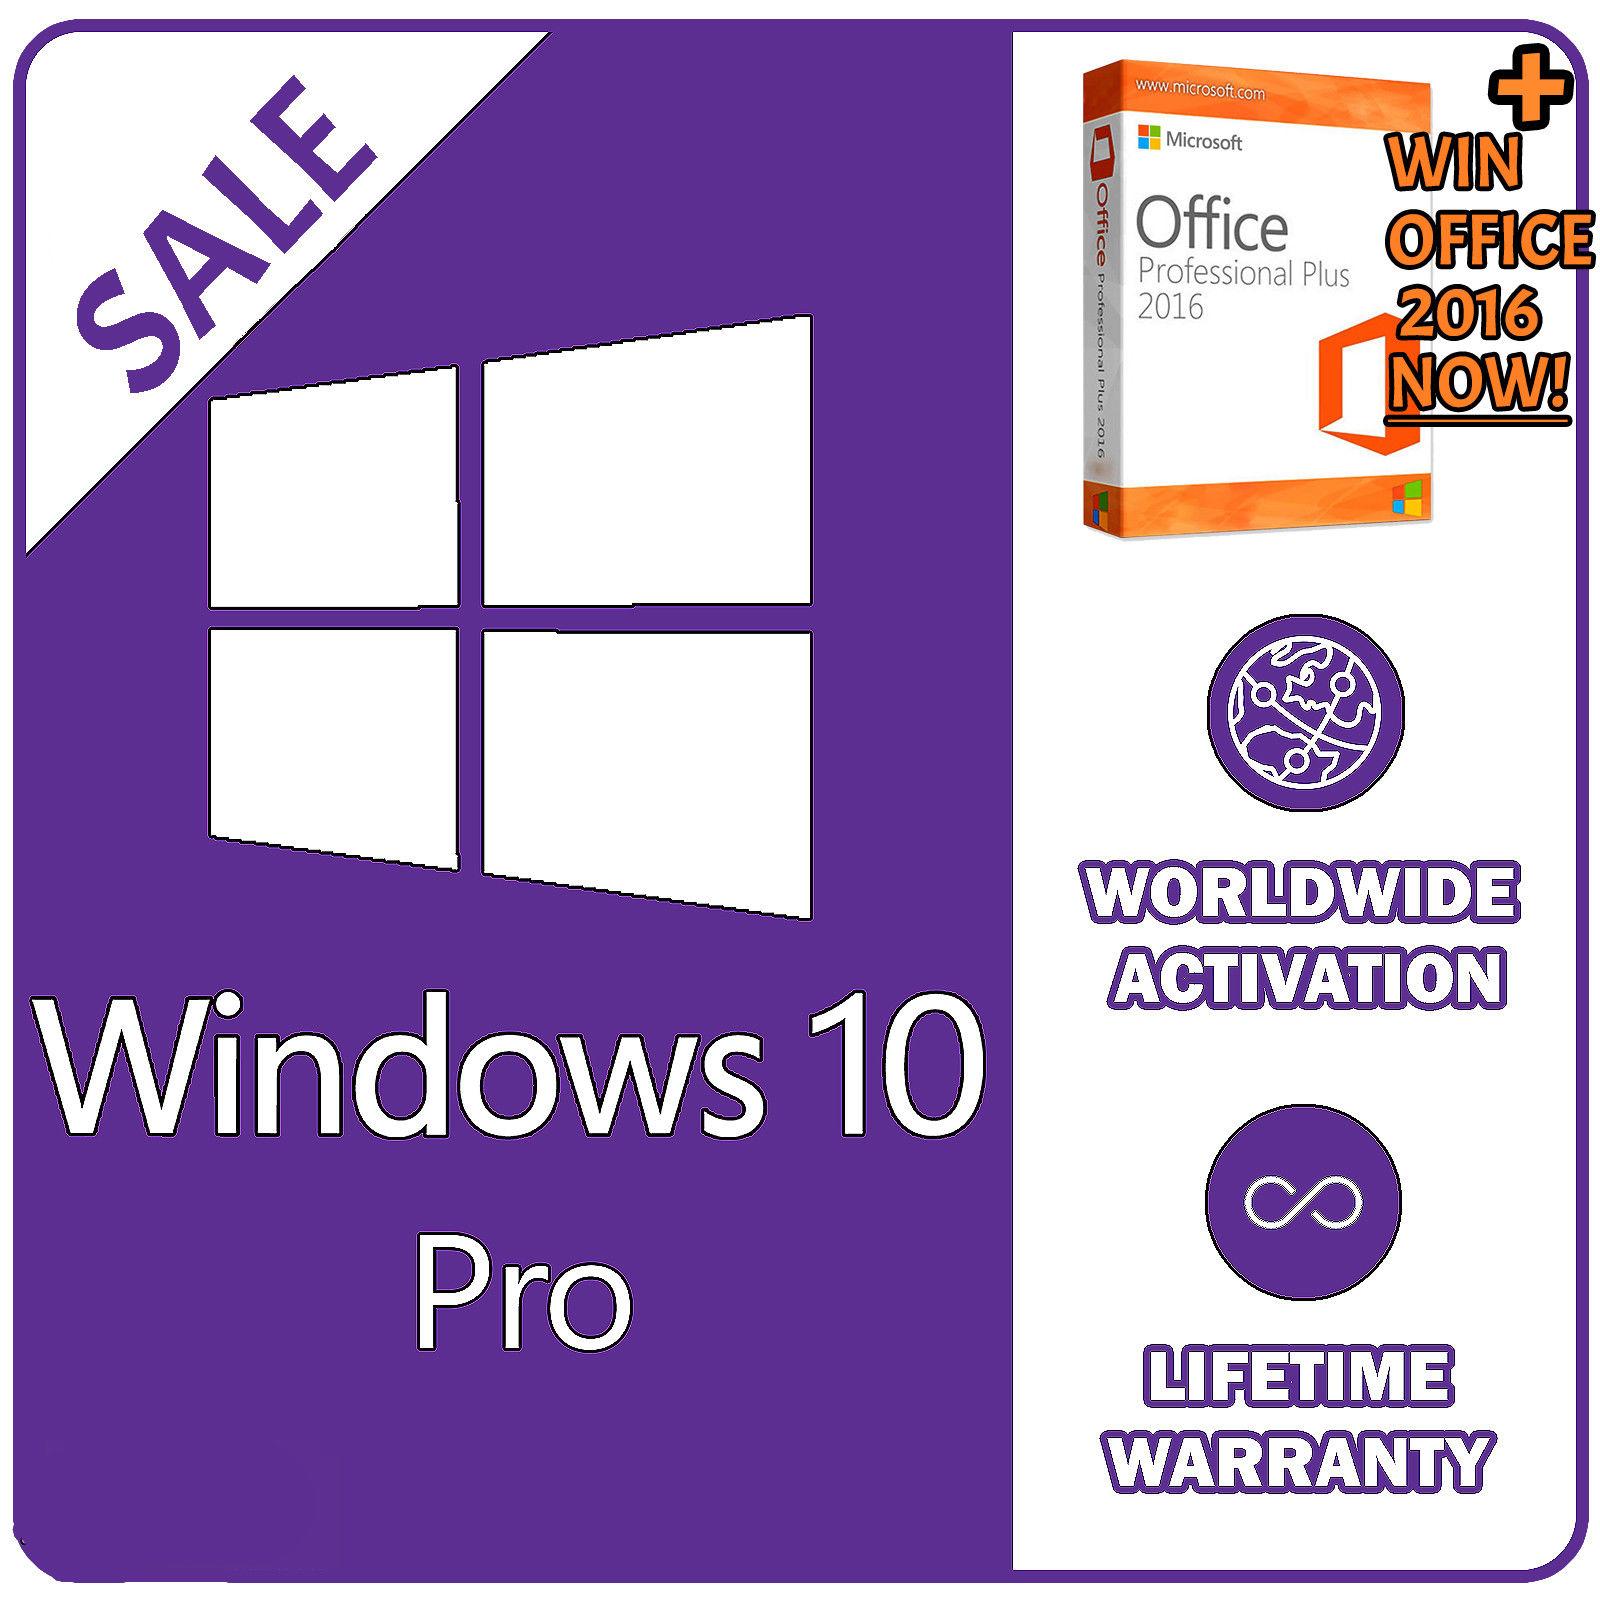 Windows 10 Pro license key 32/64bit £2.20-£2.49 @ Ebay / instant-pc-activation